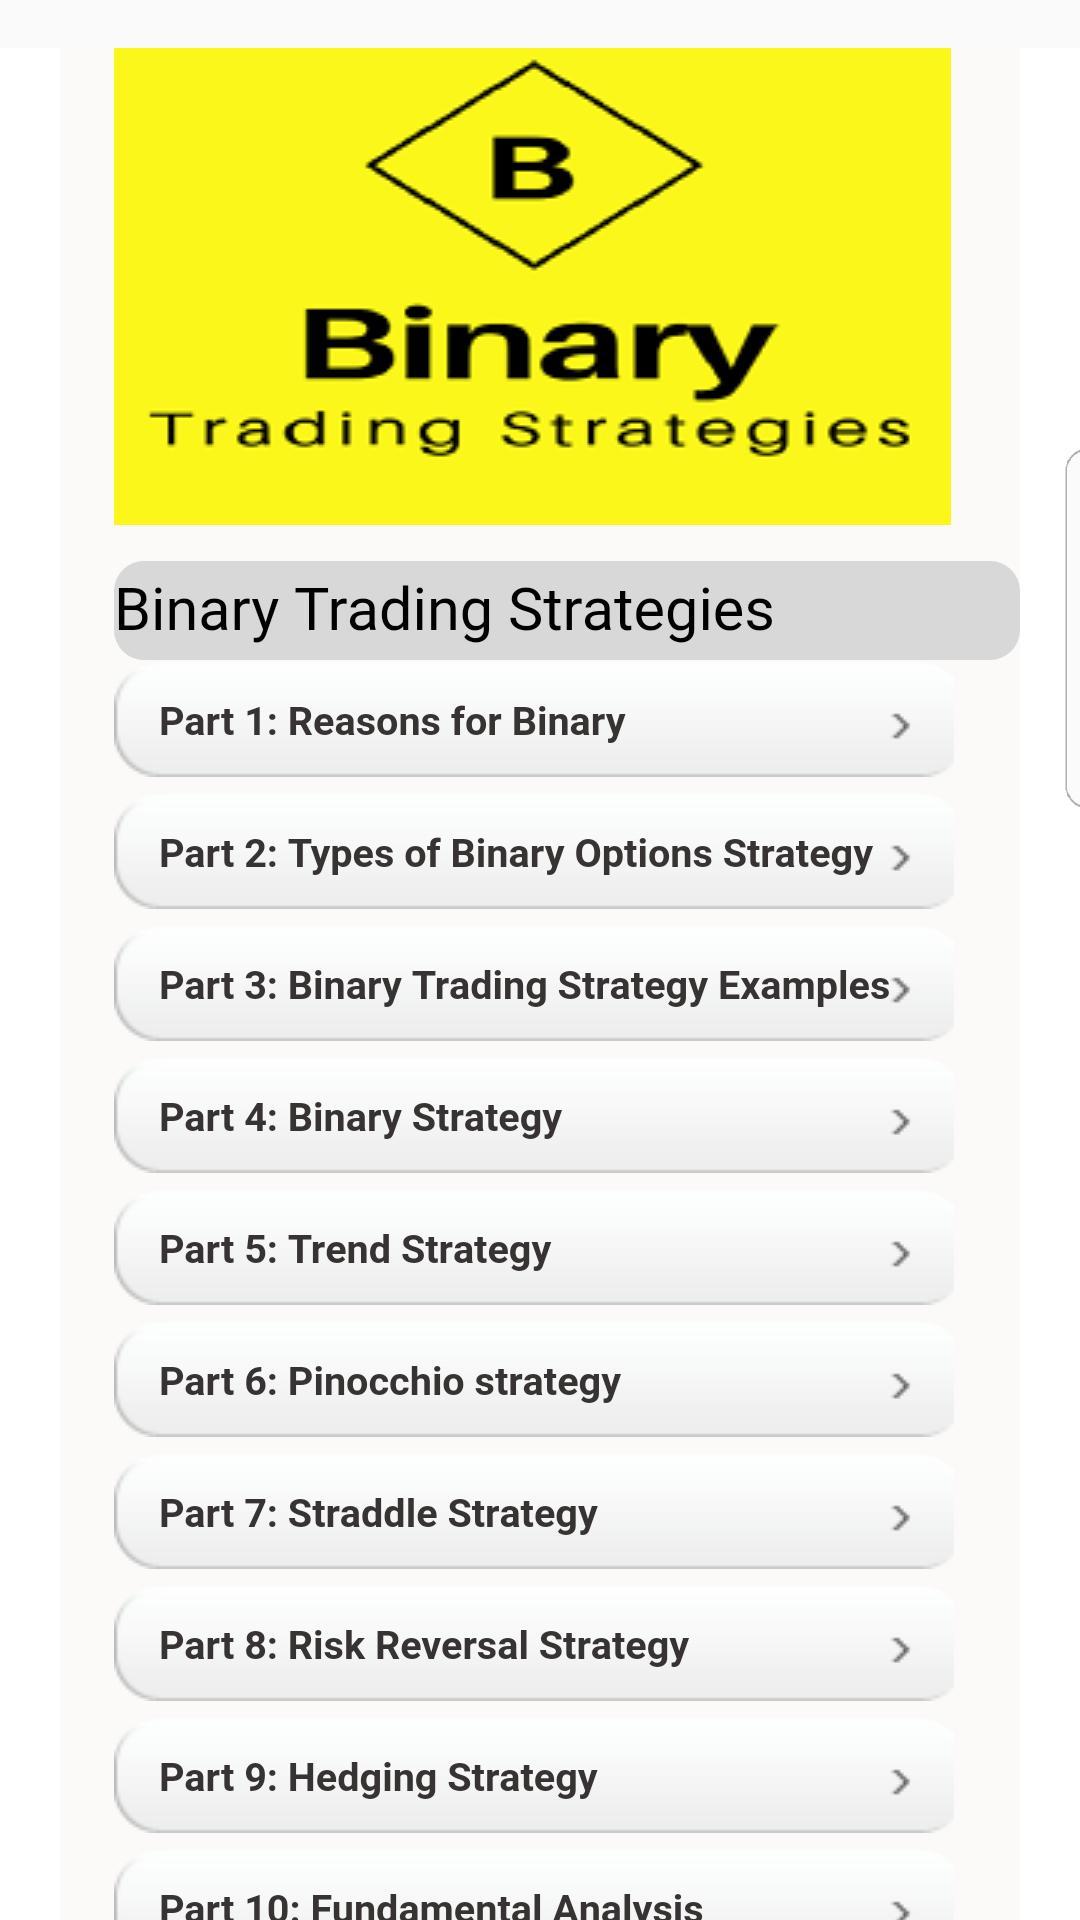 B binary learn binary options nfl line history football betting odds